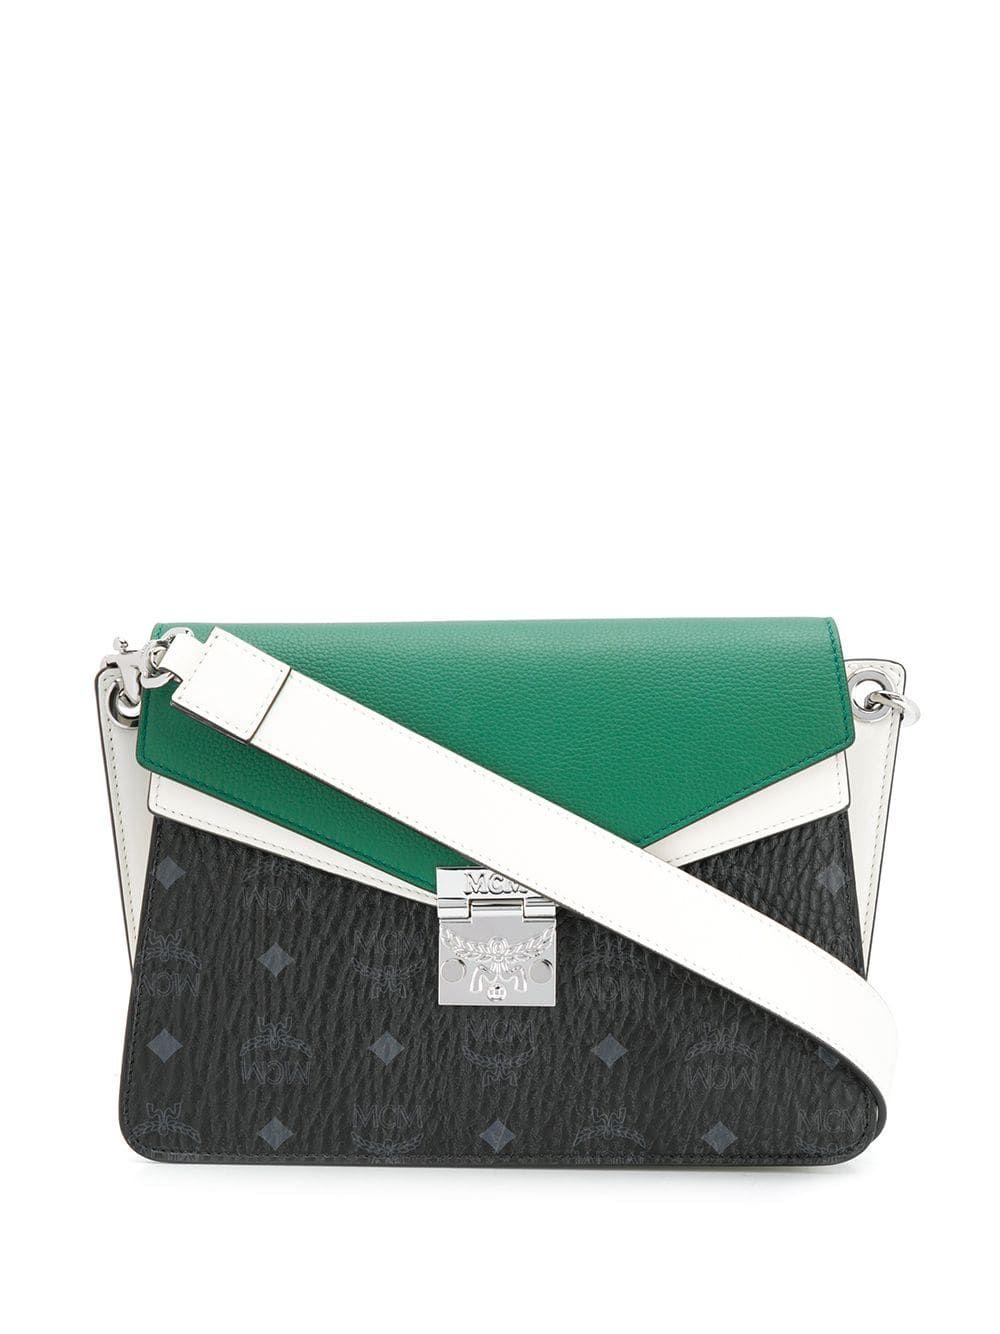 Mcm colour block shoulder bag green | Shoulder bag, Bags